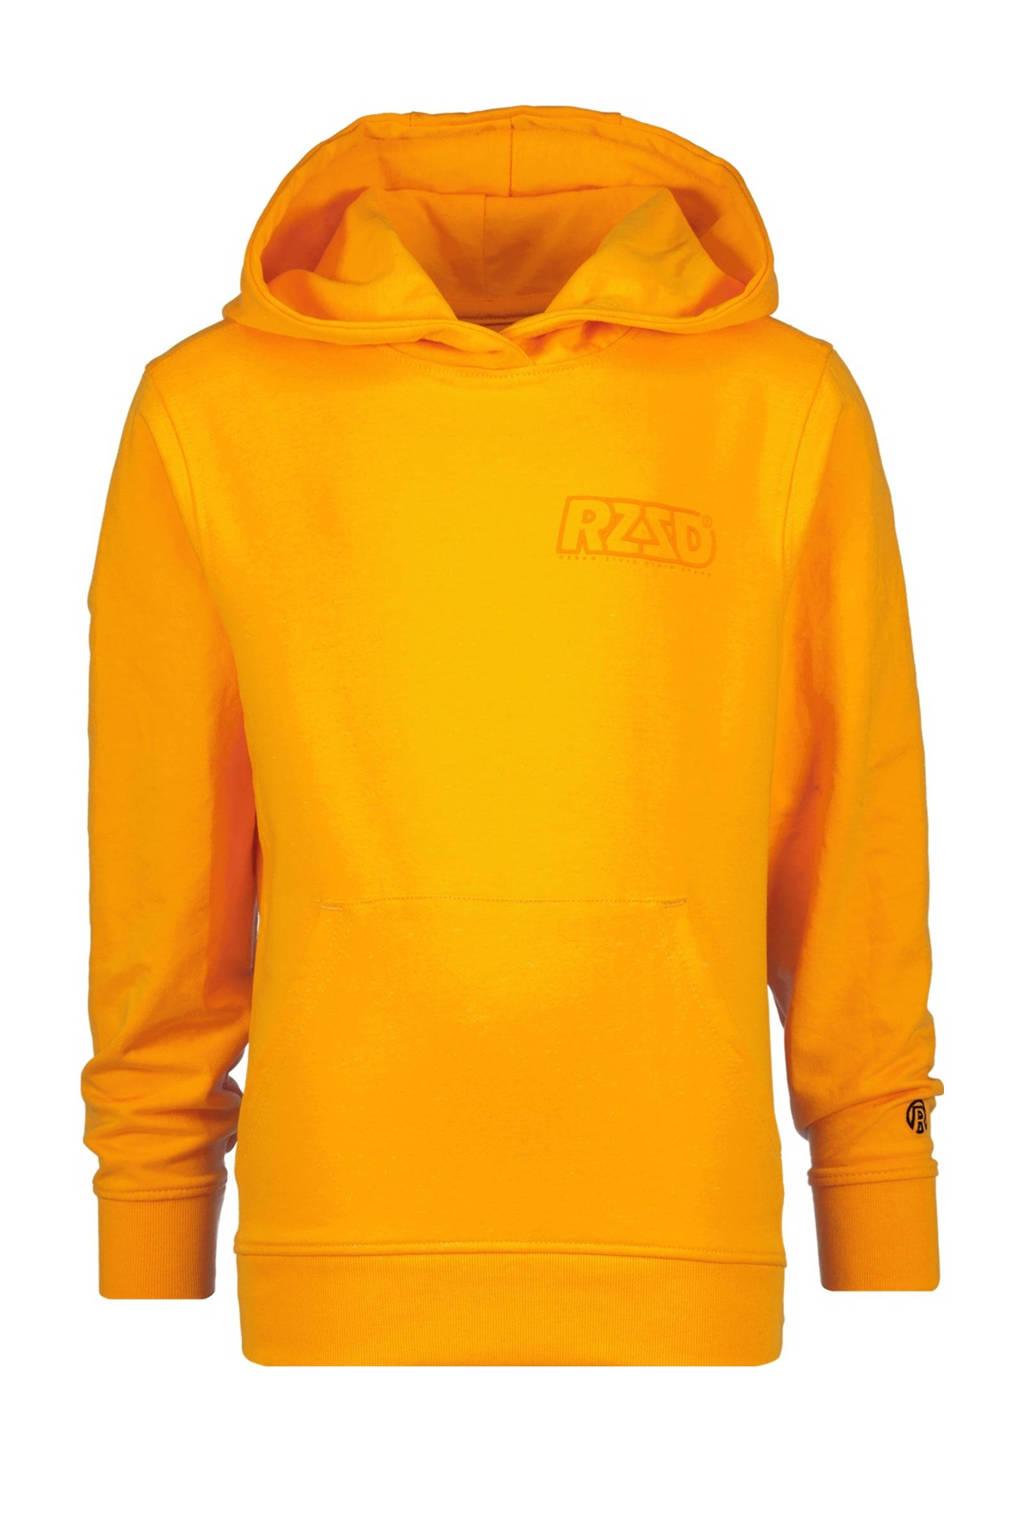 Raizzed hoodie Natal met logo neon oranje, Neon oranje